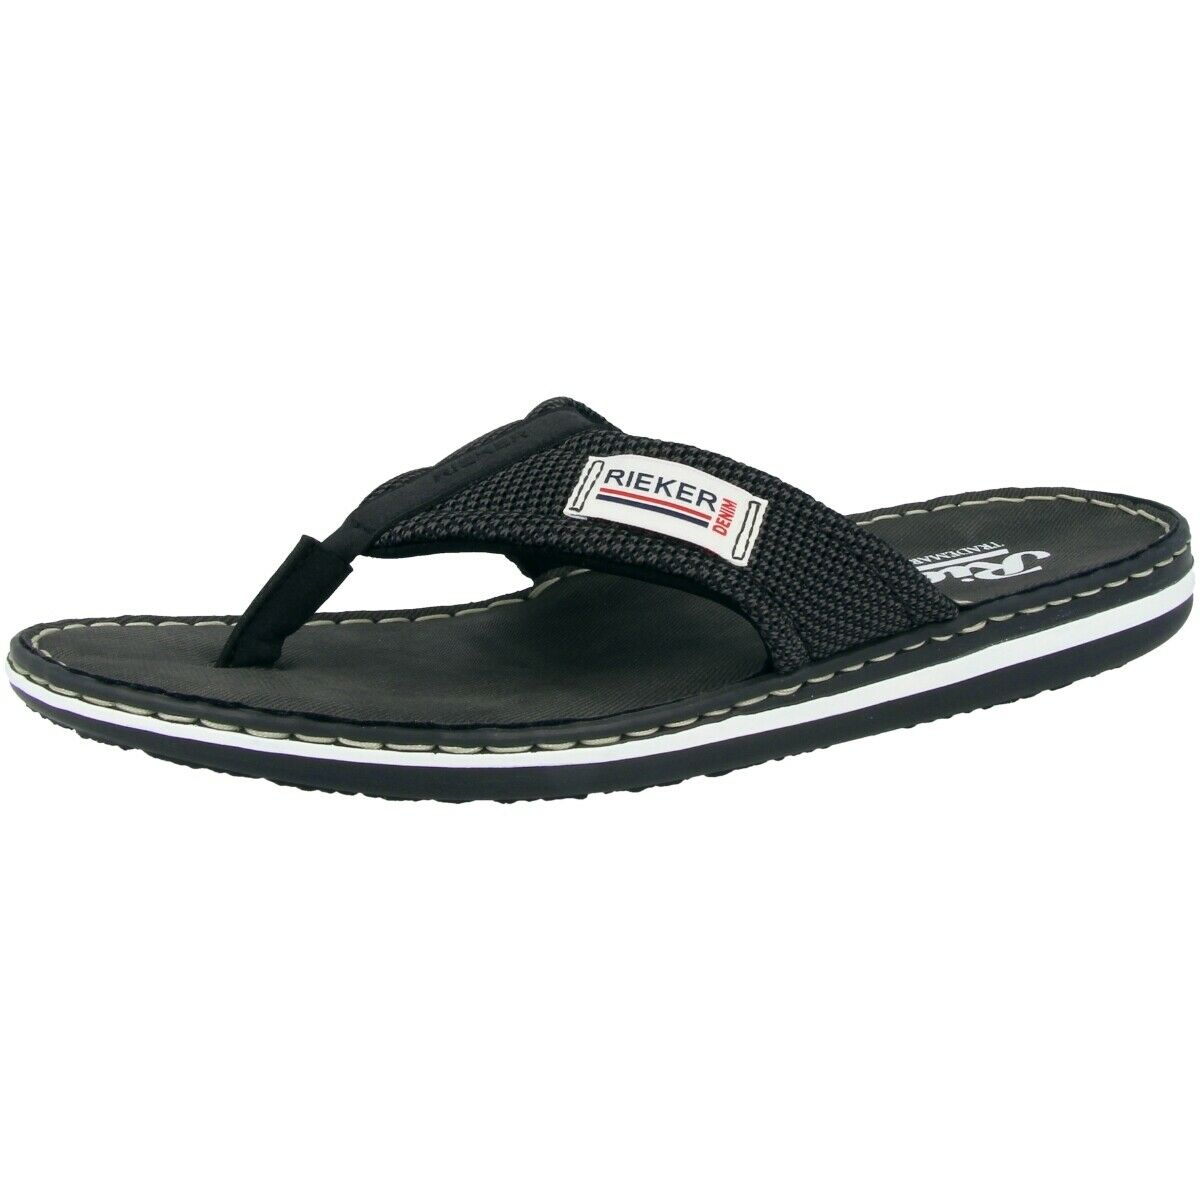 Rieker Volos-Techknit Sandals Flip-Flops Anti-stress Bridge shoes 21089-00